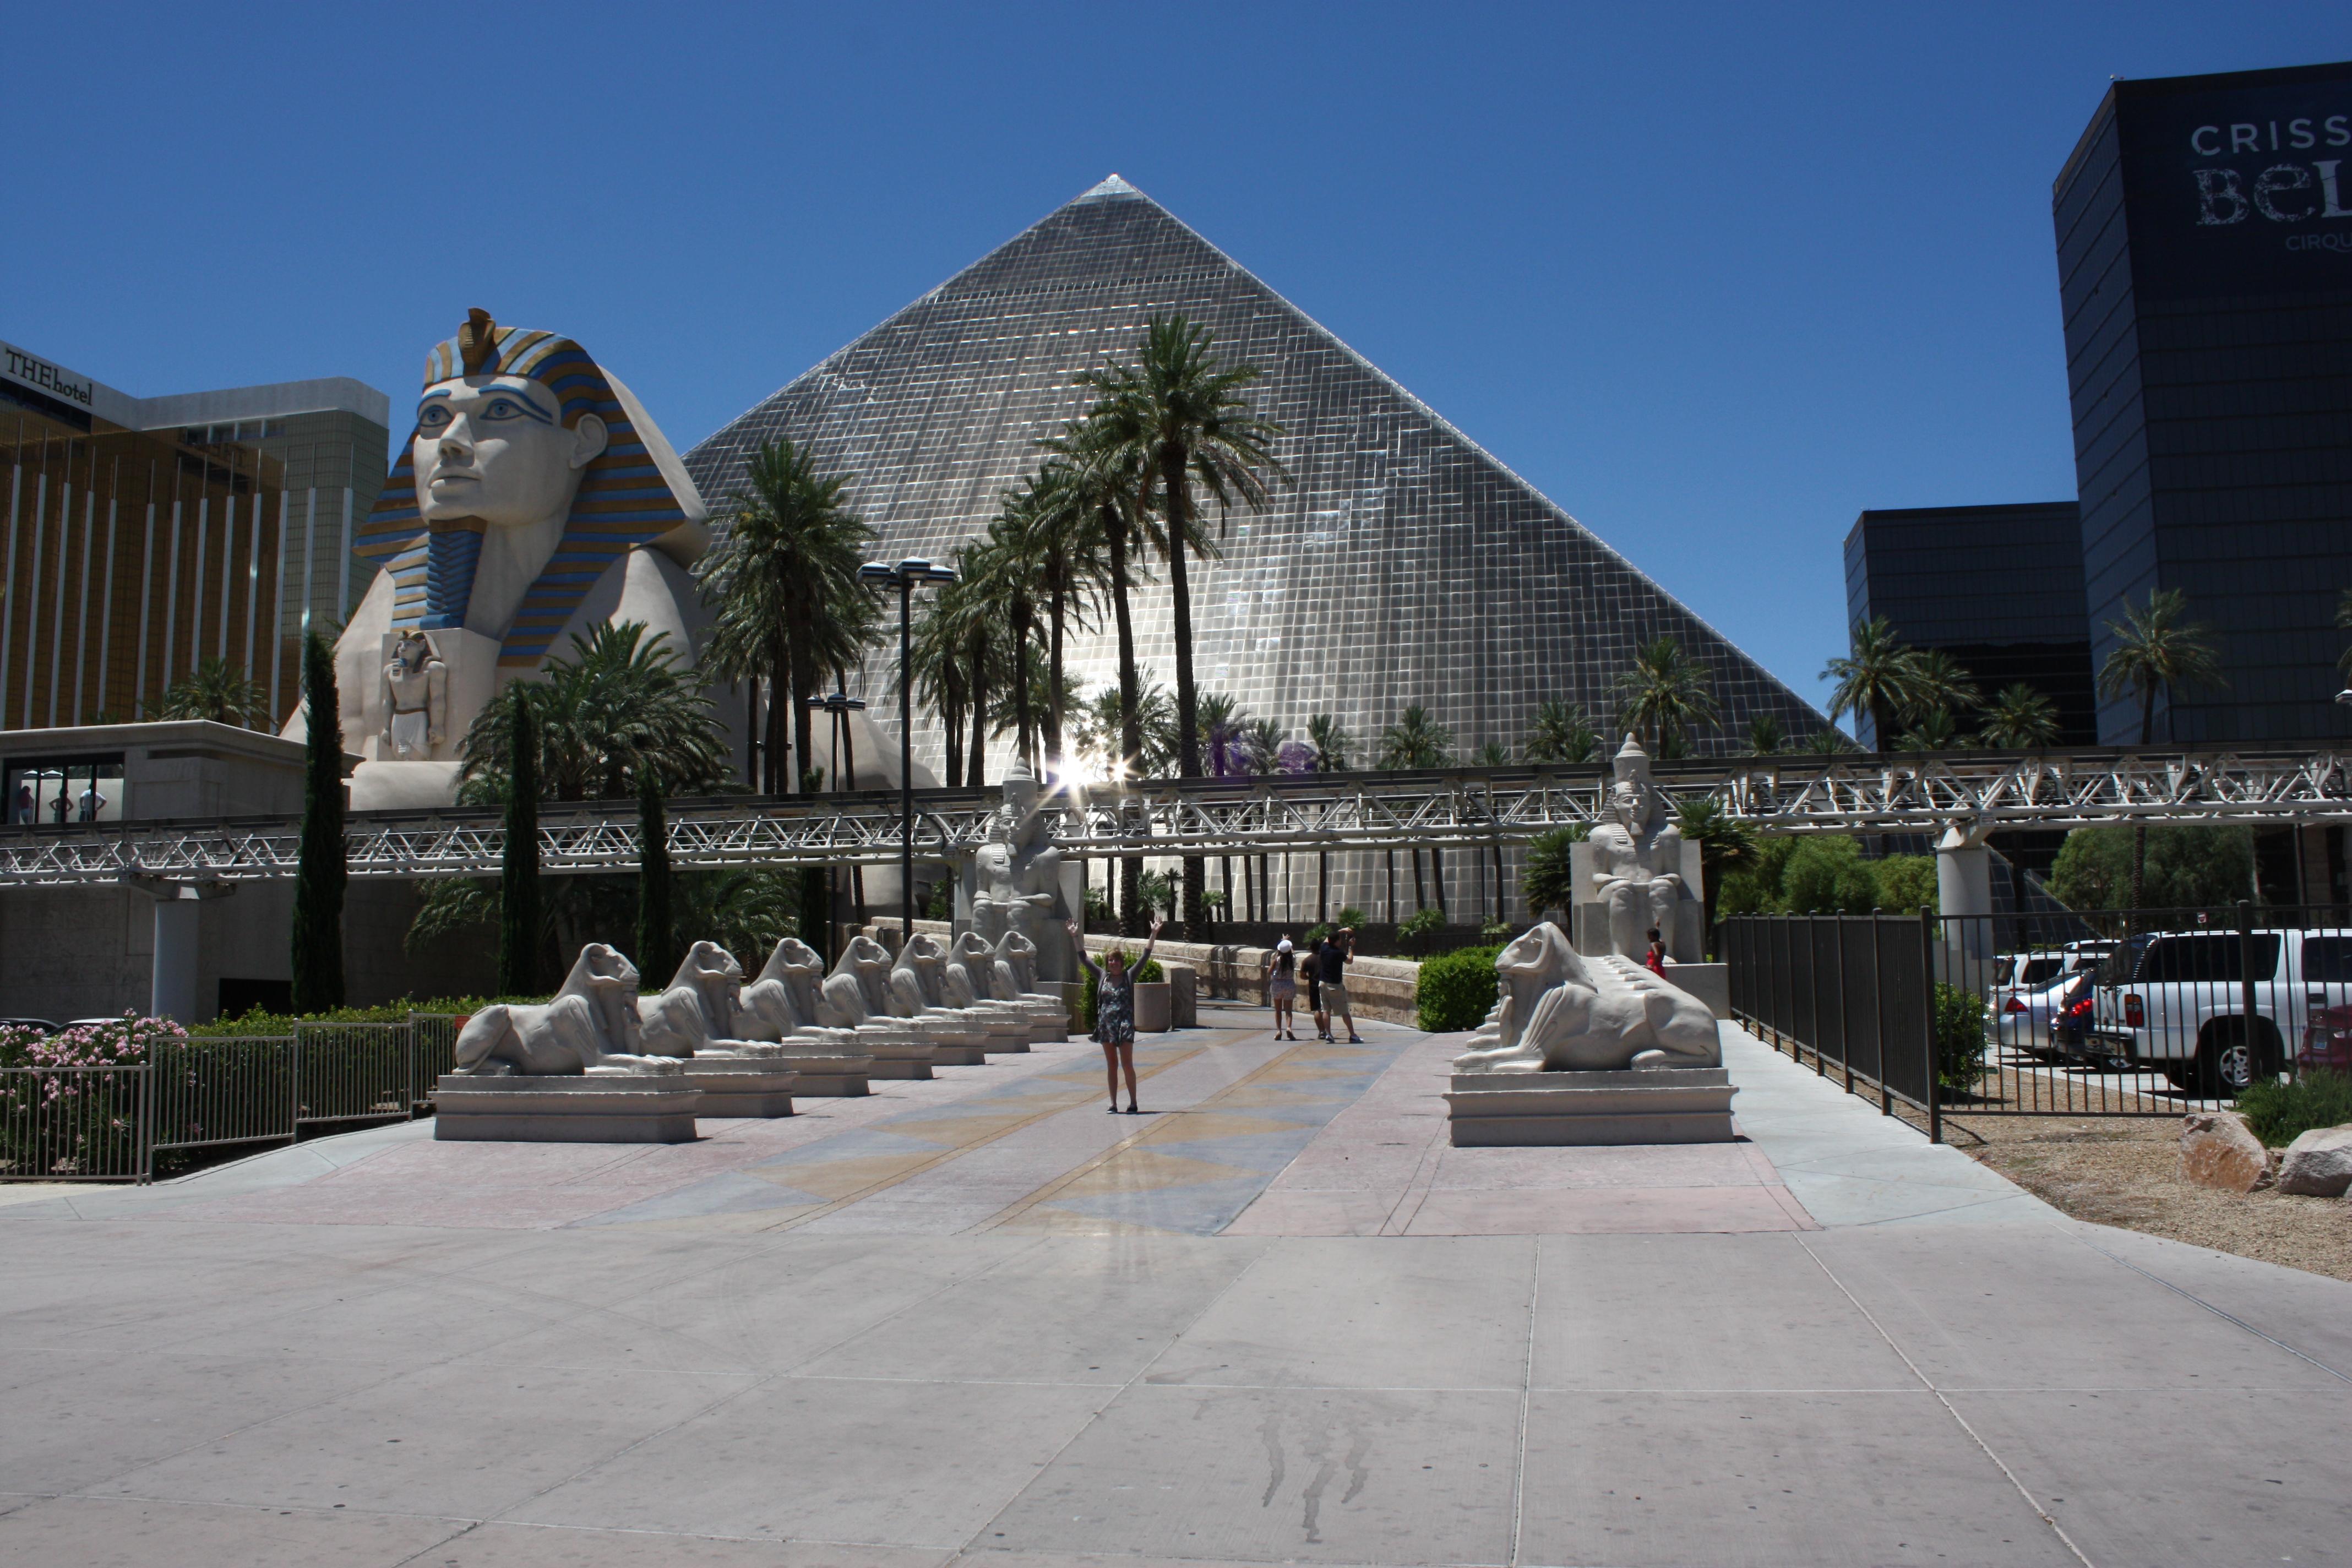 Cody Rapol and Keeshia McDonald in Vegas or somewhere close81